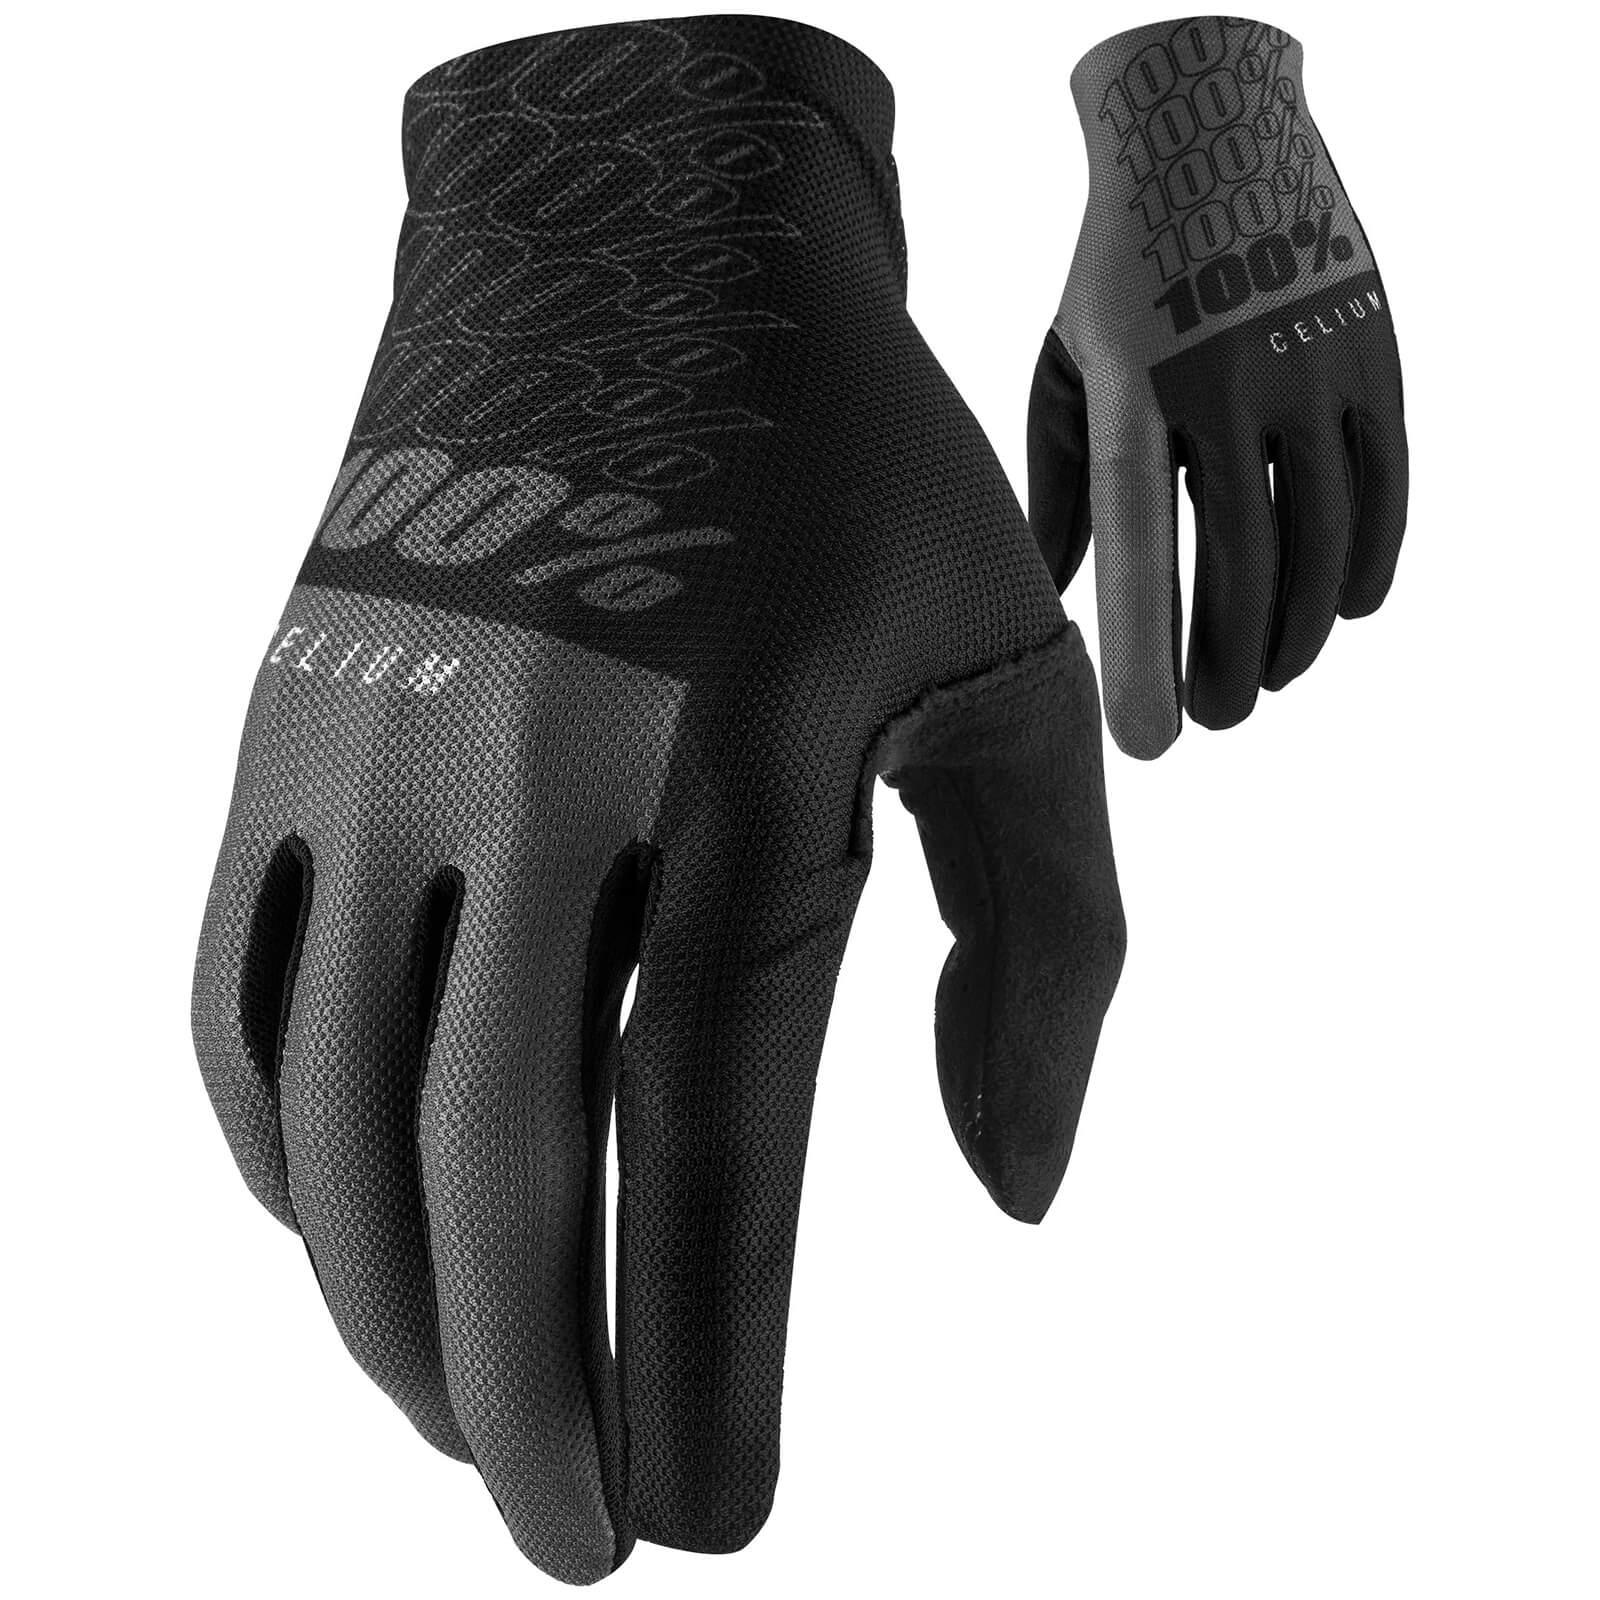 100% Celium MTB Gloves - XL - Schwarz/Grau